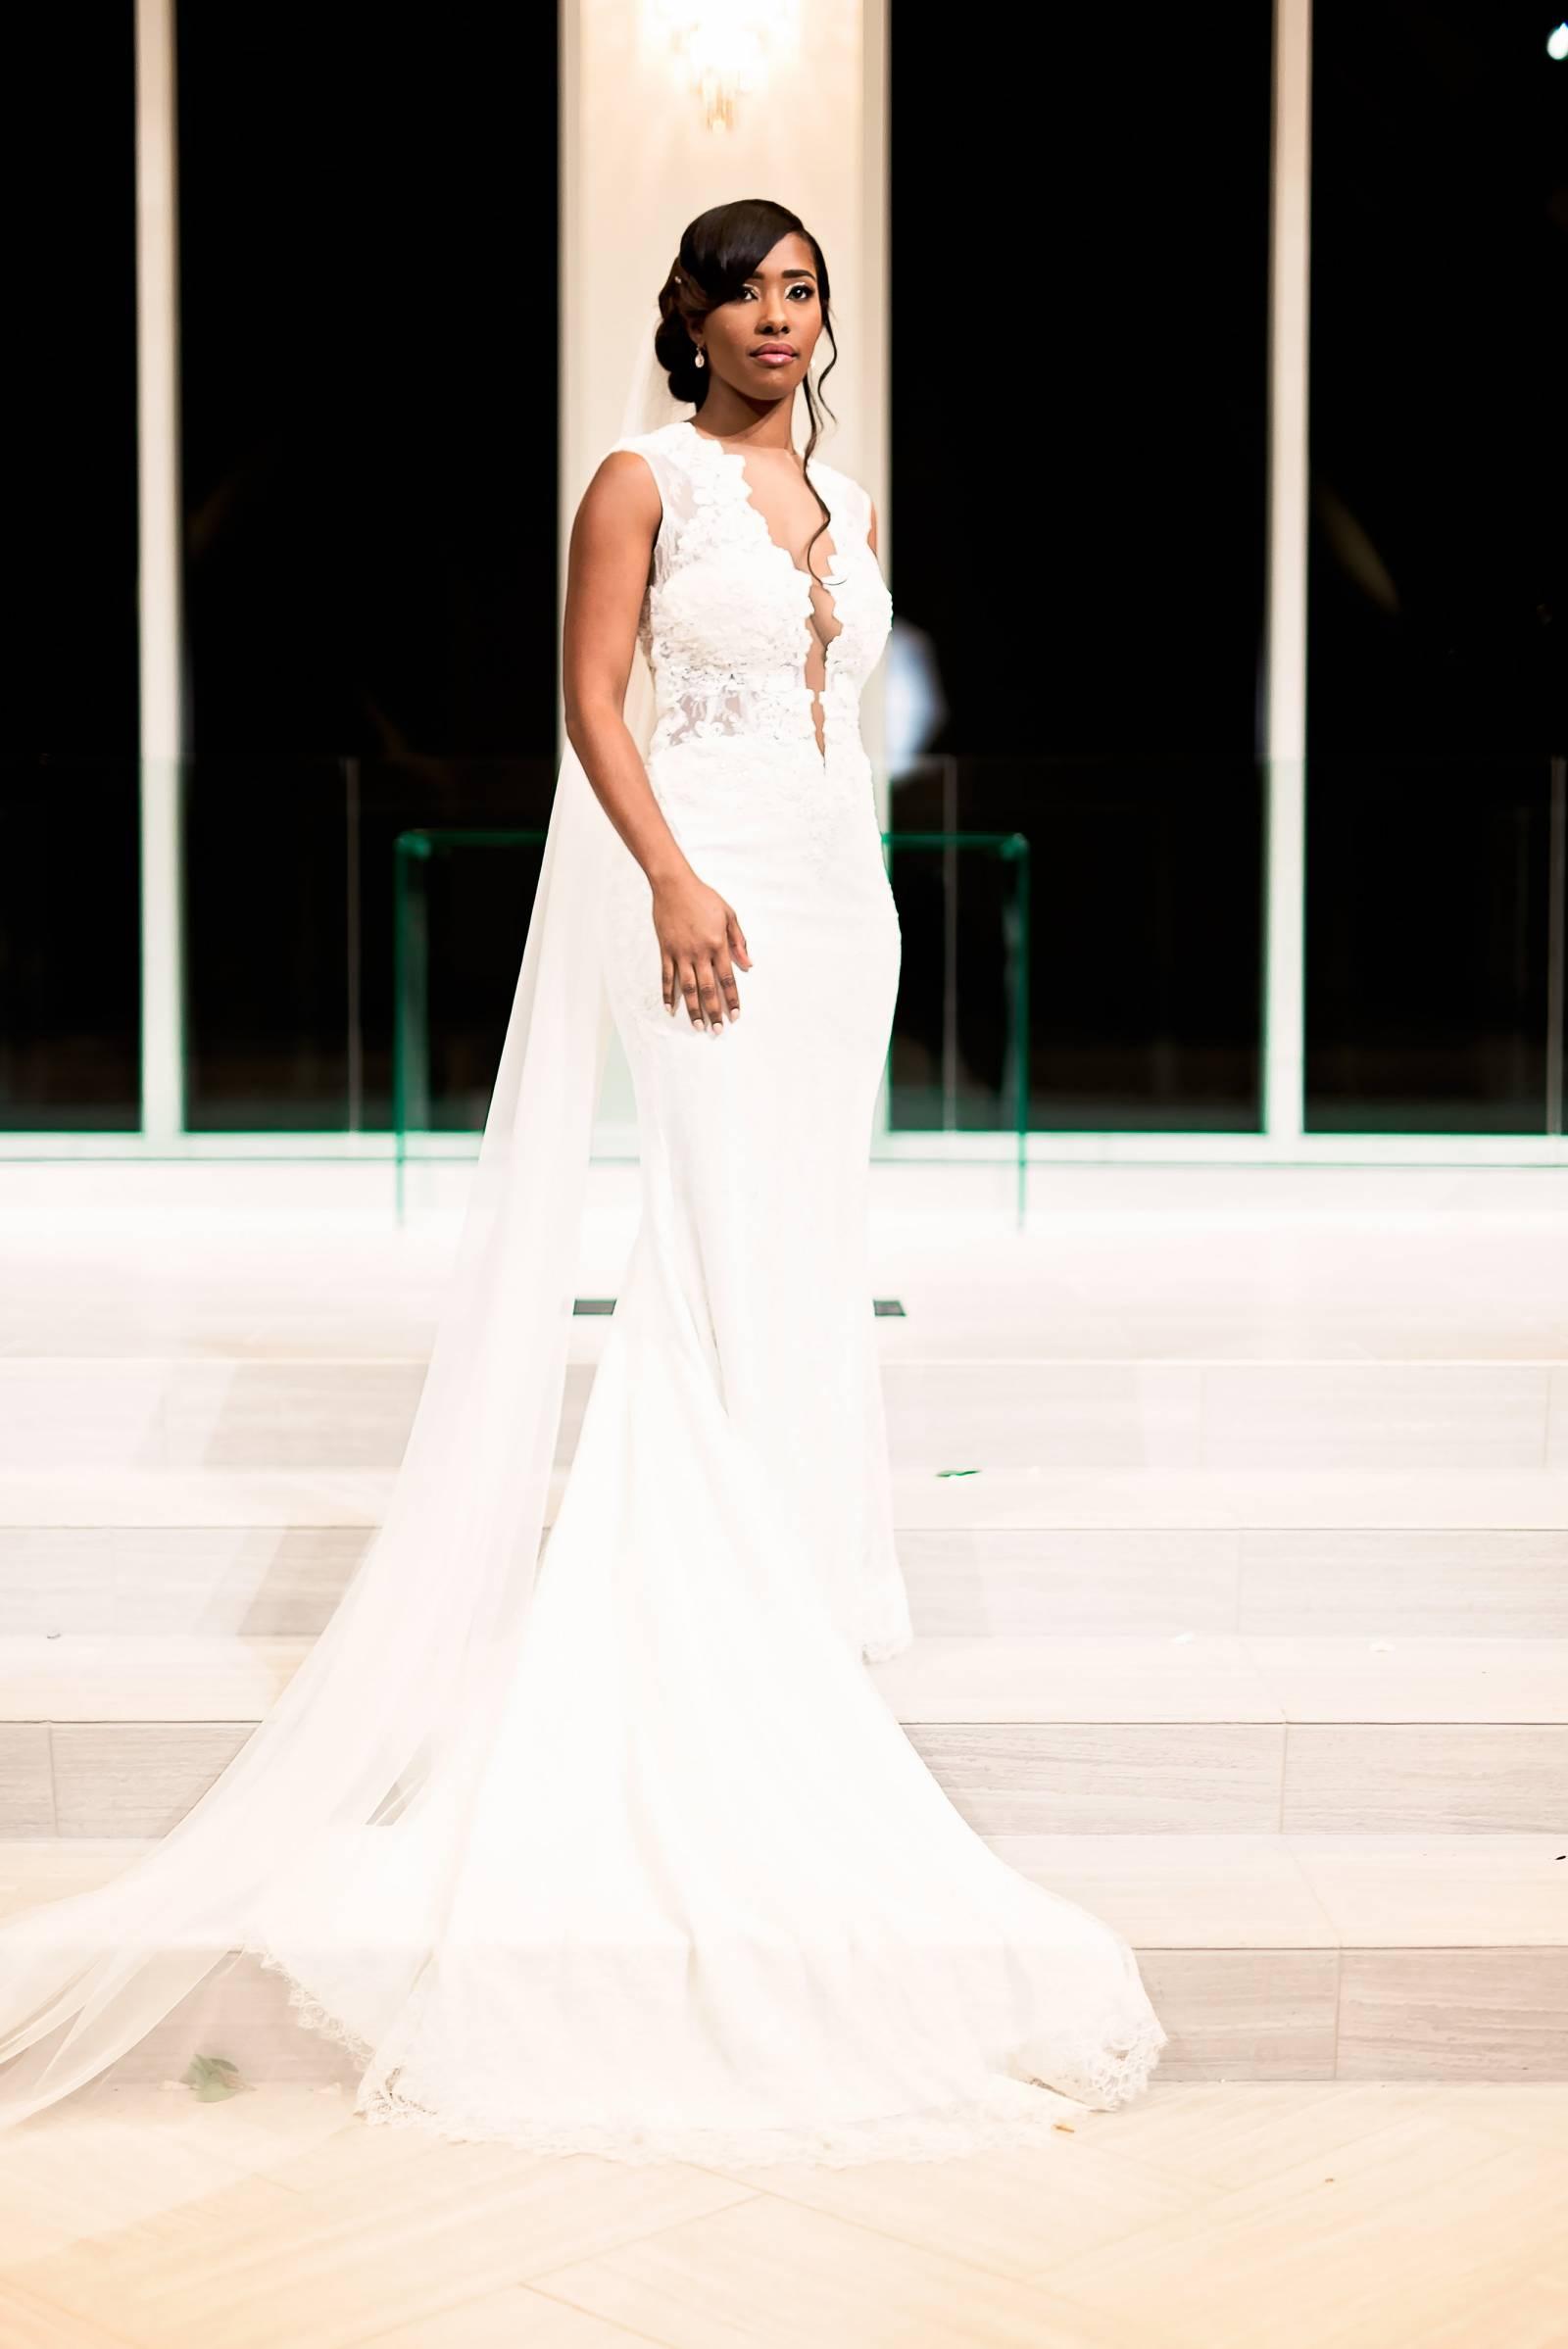 DeShana + Darryl Featured on the Black Bride - 2.0 - 16.jpg